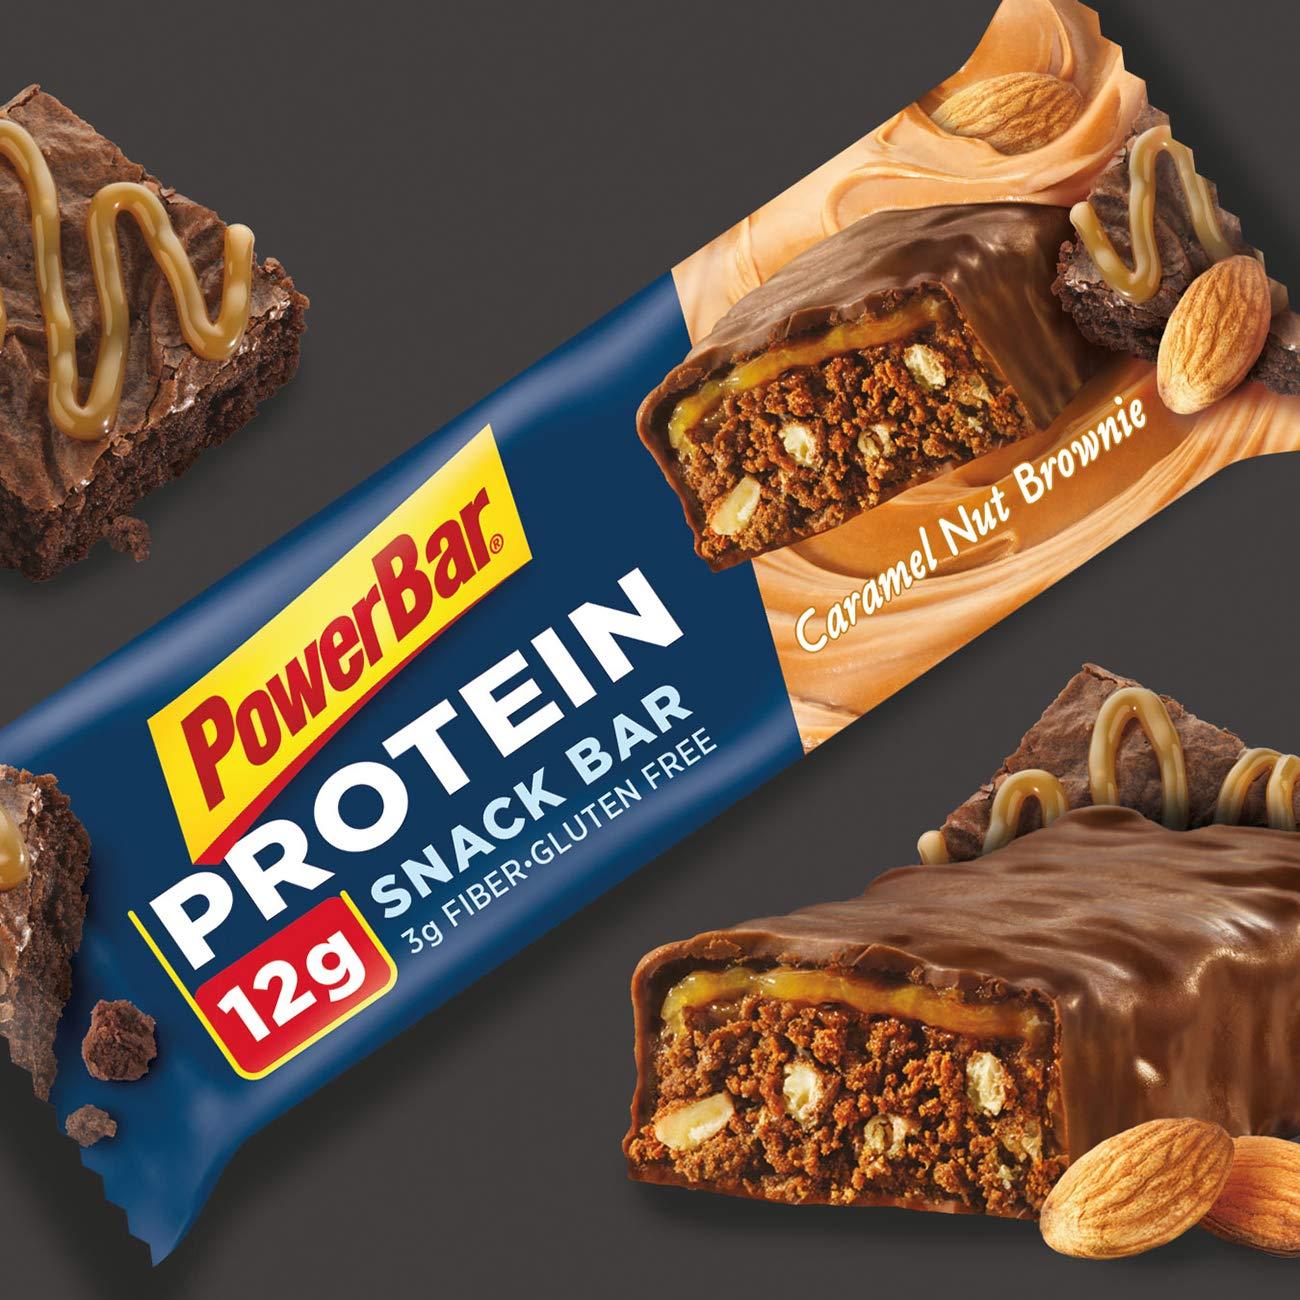 PowerBar Protein Snack Bar, Caramel Nut Brownie, 50 Gram, 1.76 Ounce Pack of 15